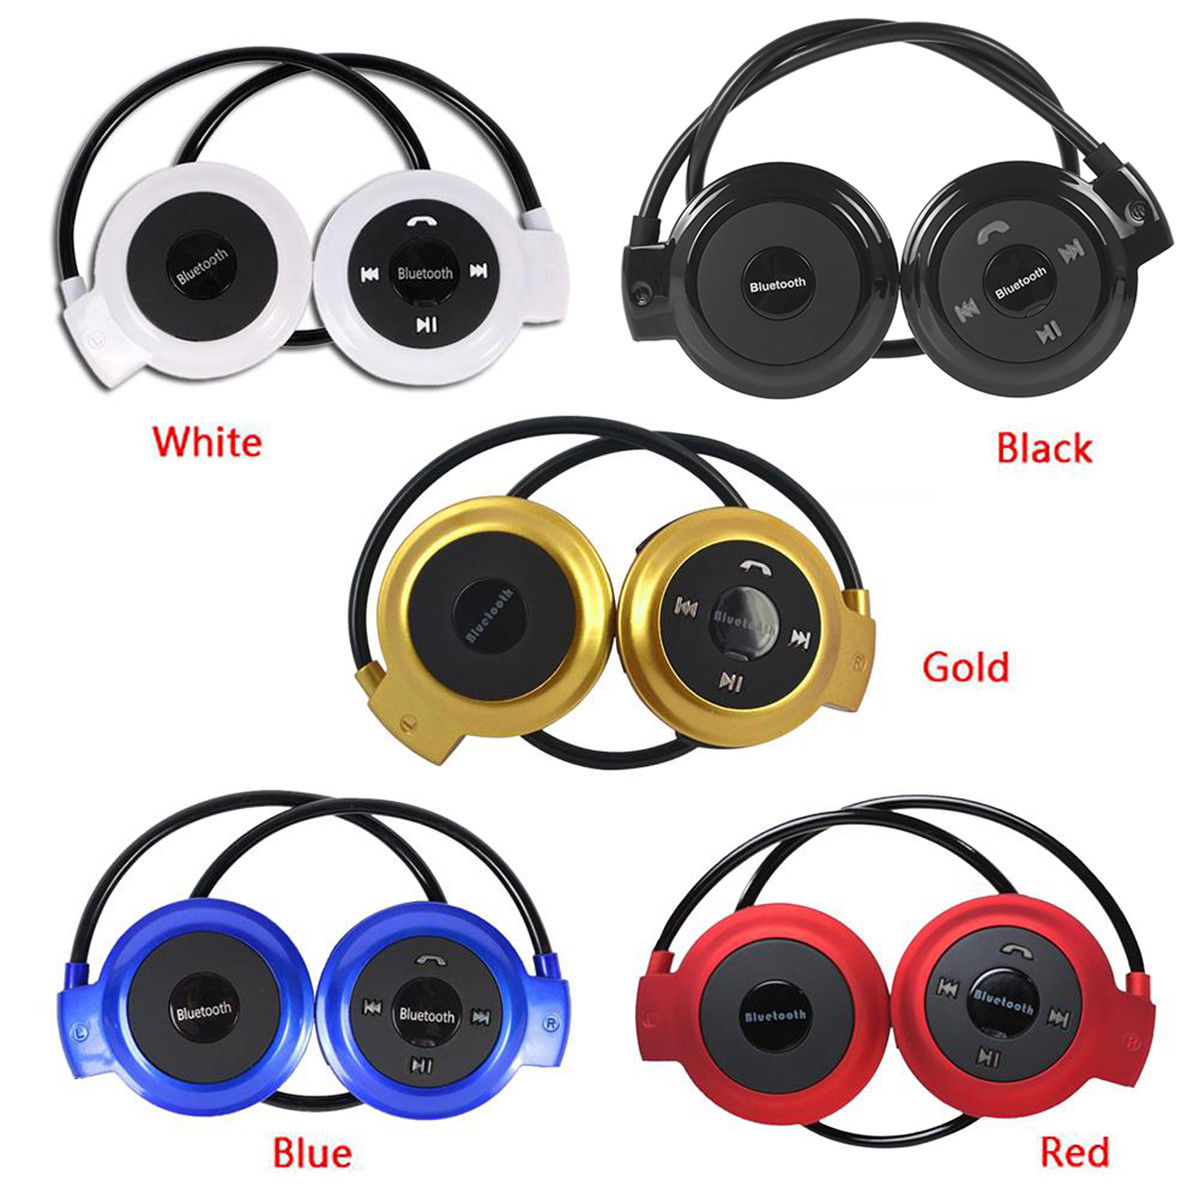 MINI503 Sport Wireless Bluetooth Headphones Stereo Earphones Mp3 Music Player Headset Earpiece Micro SD Card Slot FM Radio Mic